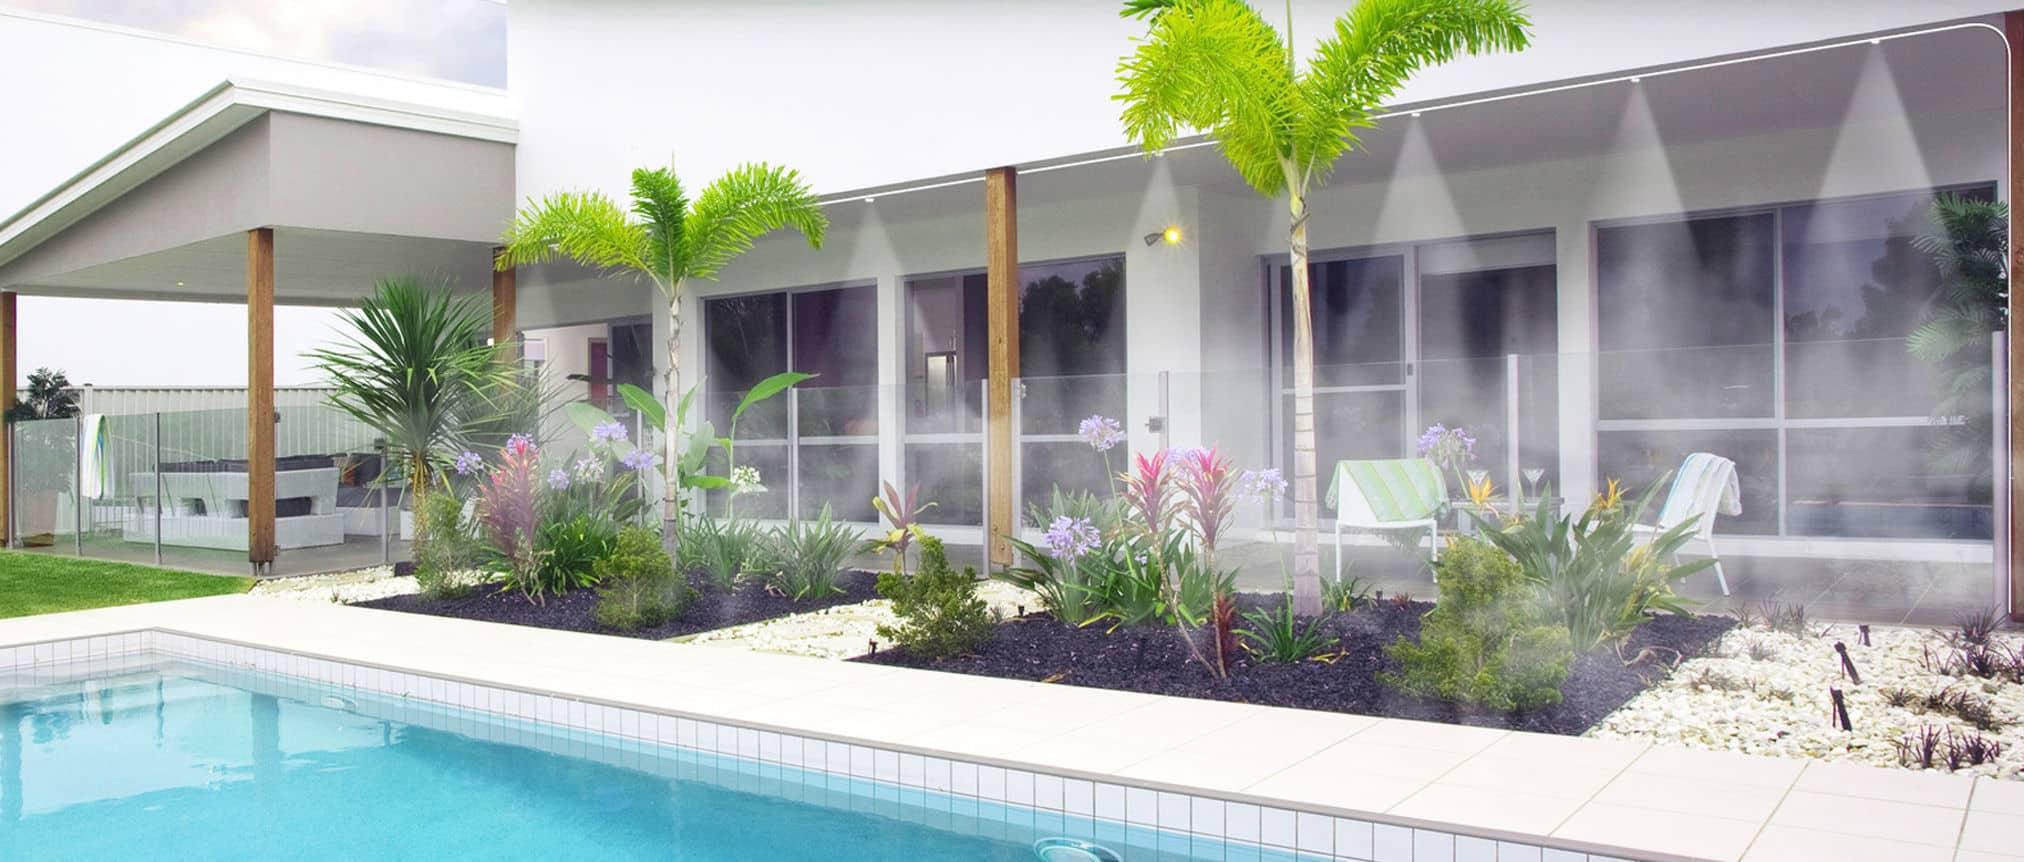 rafraichir votre terrasse avec les brumisateurs de terrasse o 39 fresh. Black Bedroom Furniture Sets. Home Design Ideas